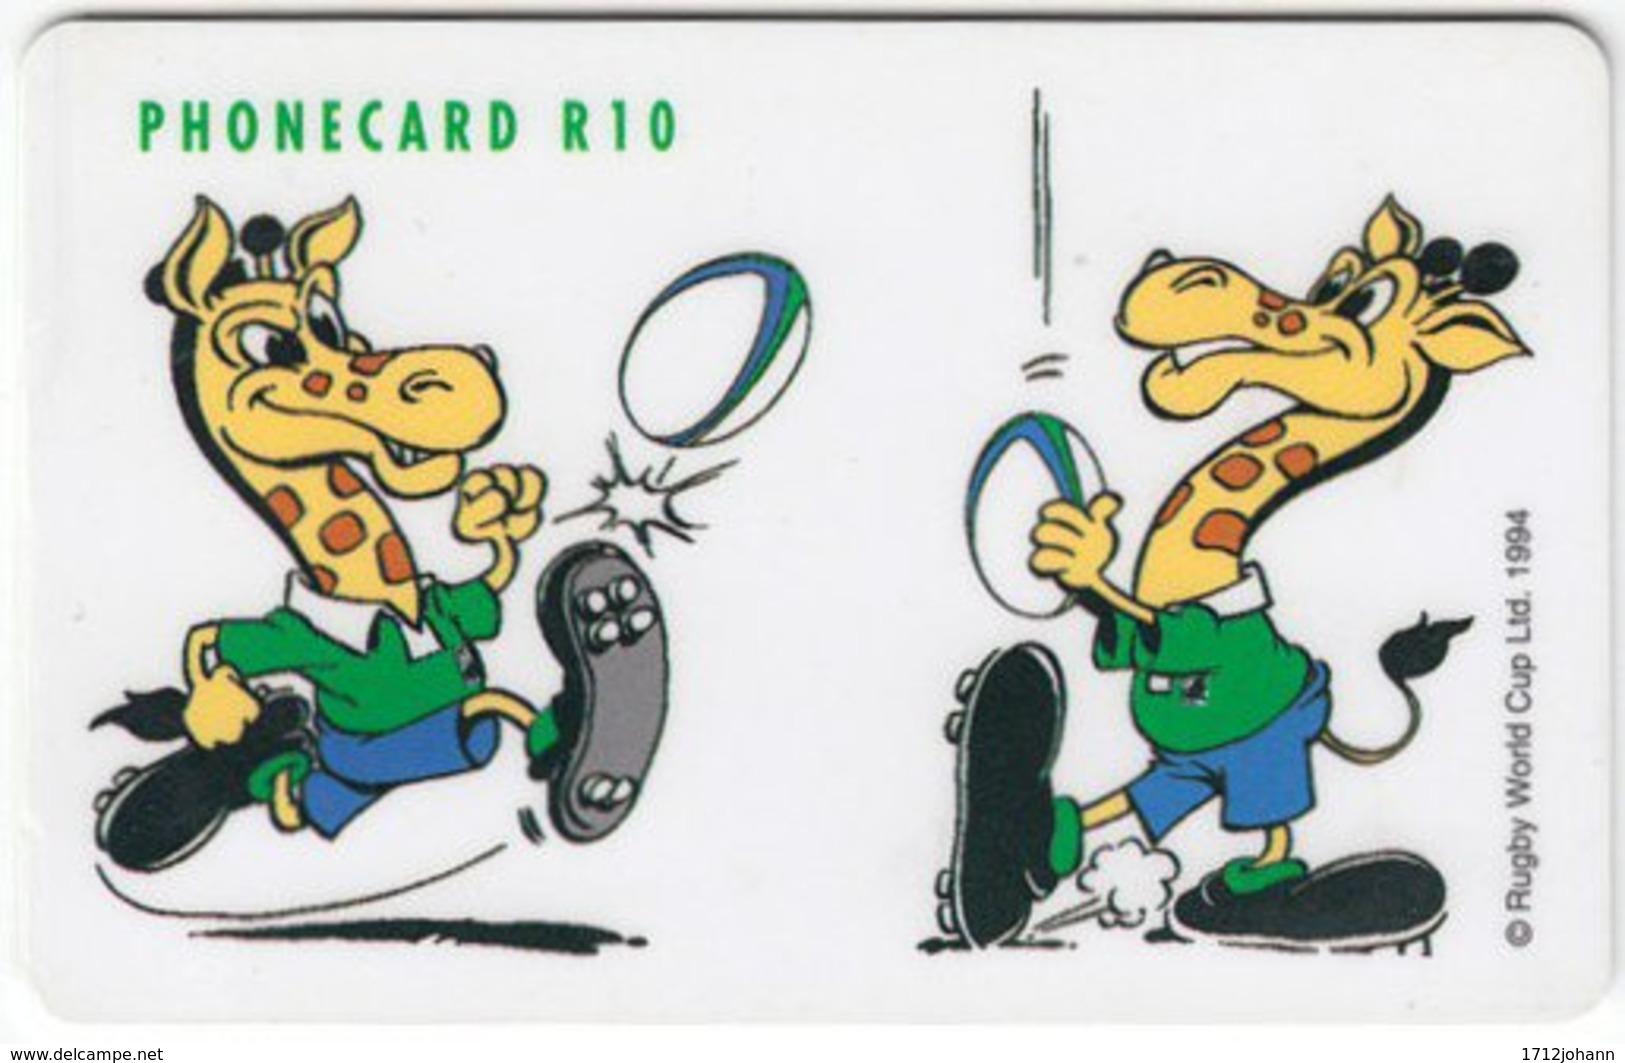 SOUTH AFRICA A-251 Chip Telkom - Sport, Event, Rugby, Cartoon, Animal, Giraffe - Used - Afrique Du Sud